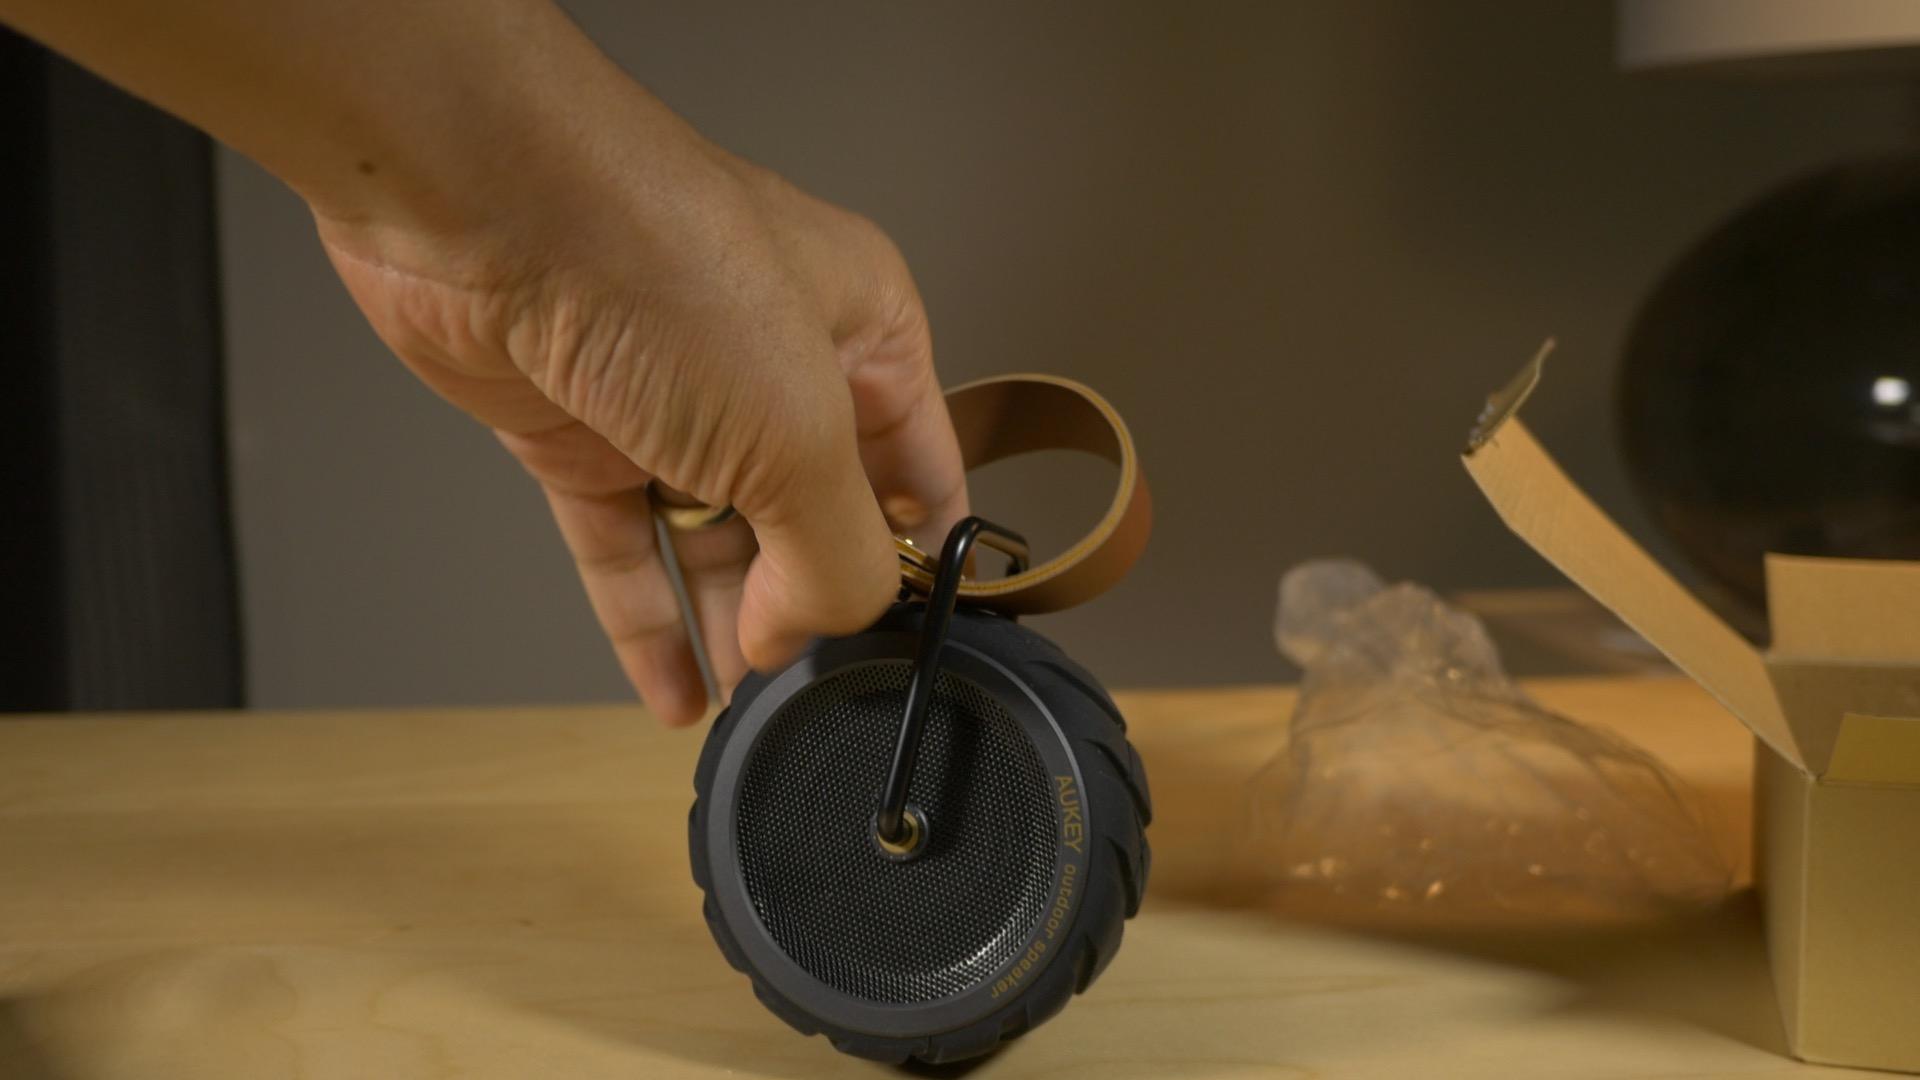 aukey bluetooth speaker unboxing